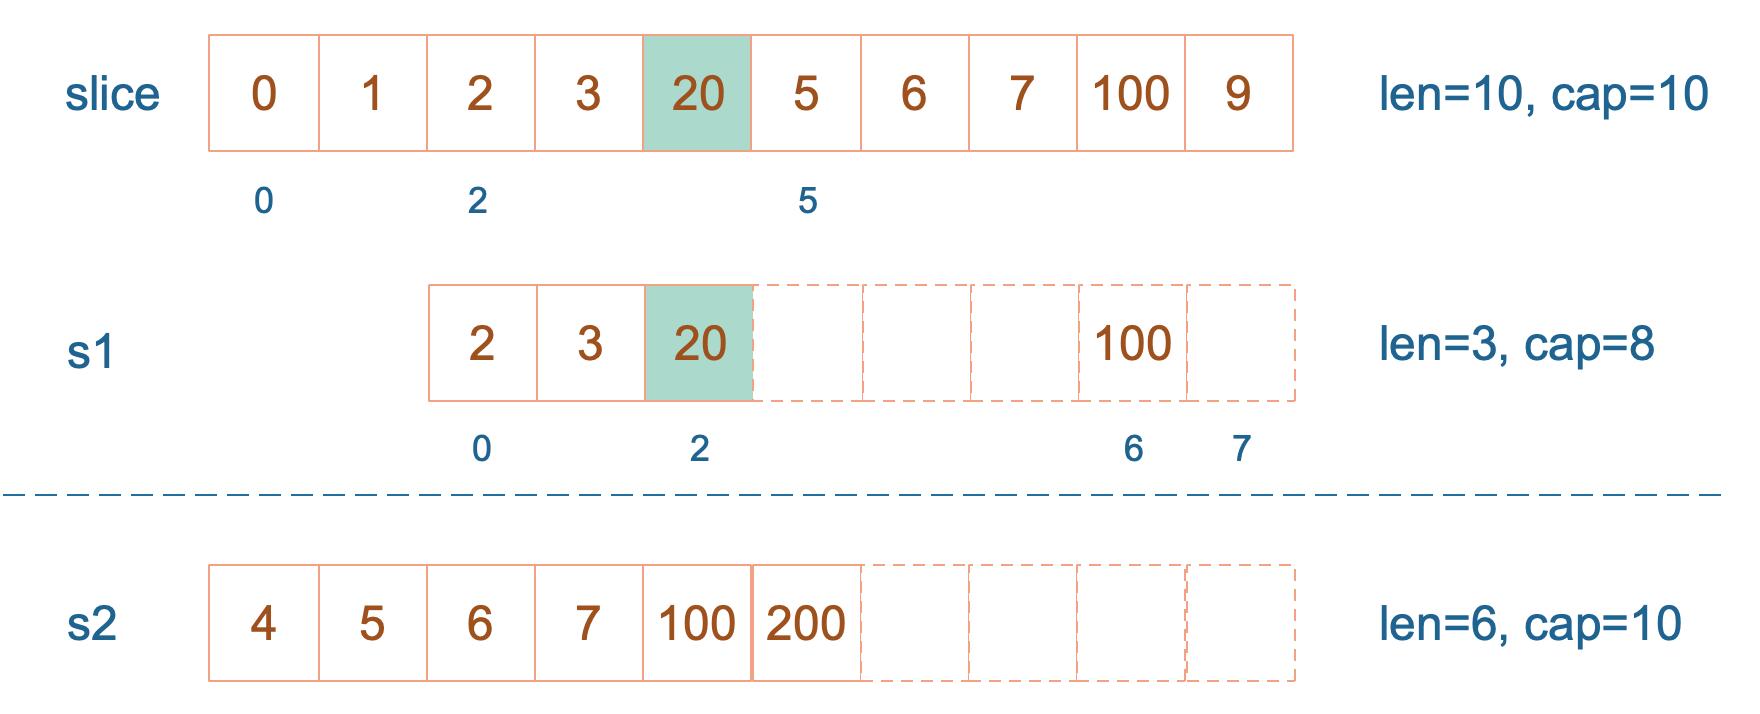 s1[2]=20